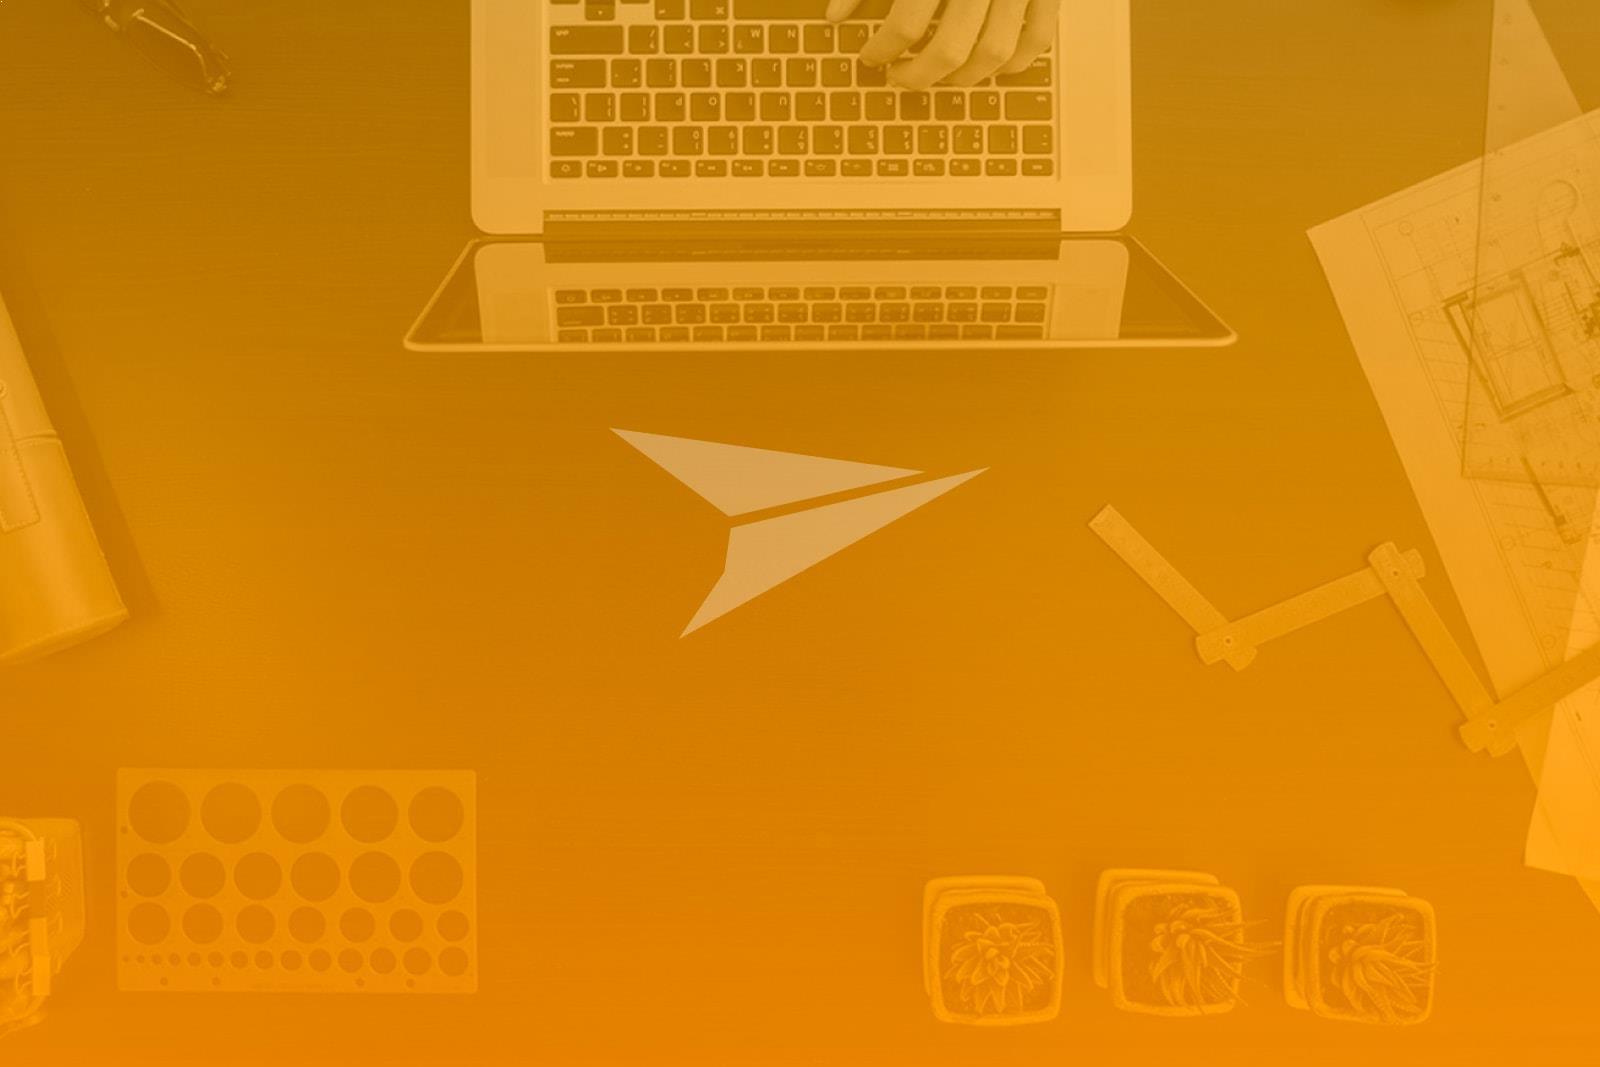 Mailjet, Herramienta de Emailing